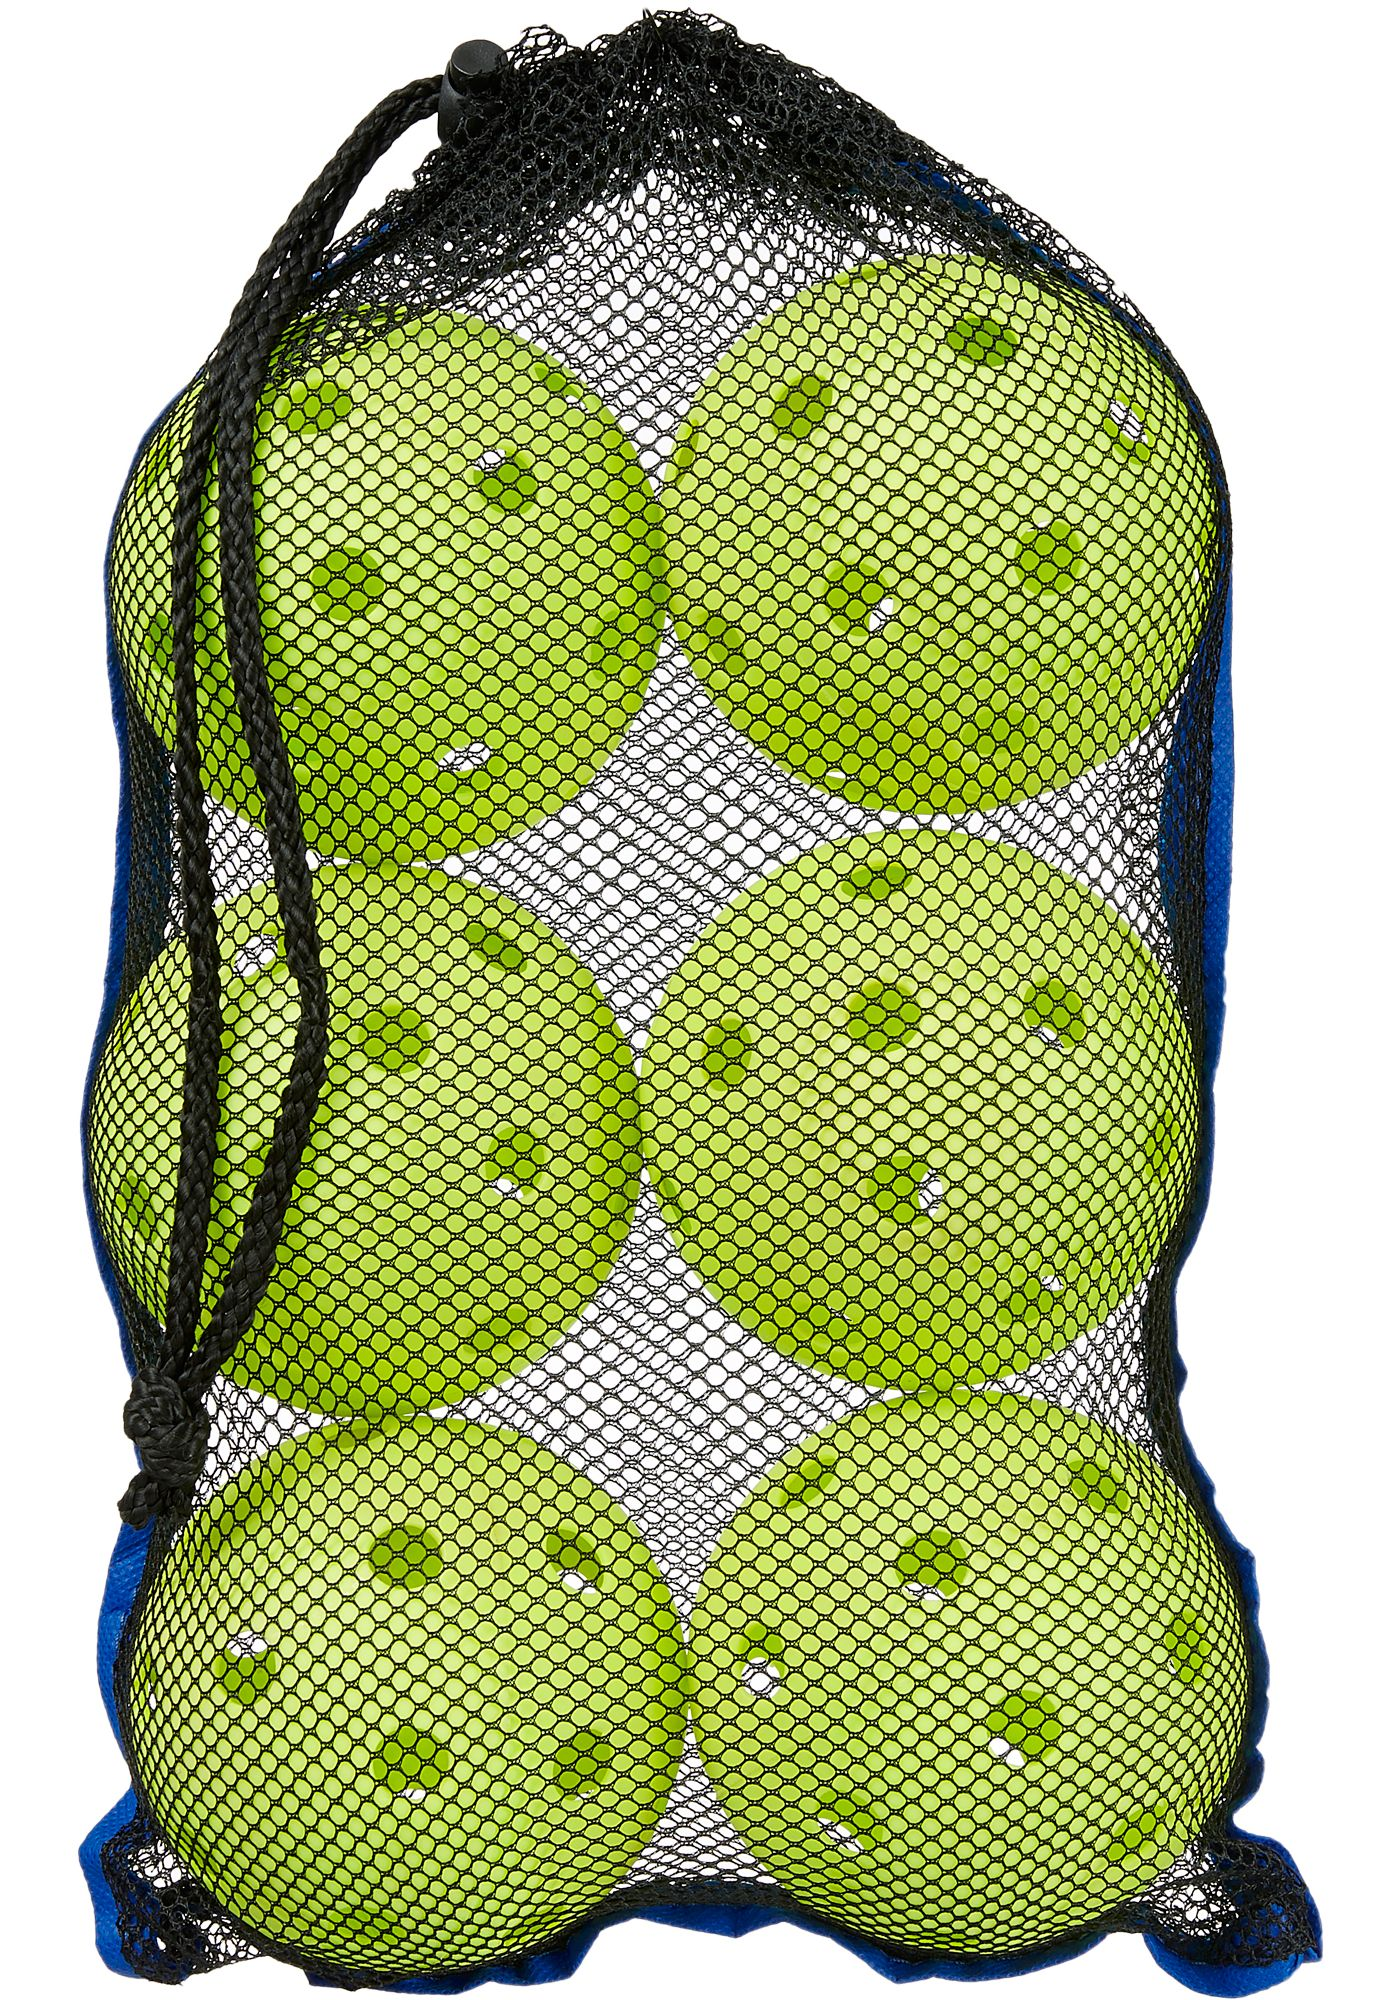 PRIMED Uncrush-A-Ball Softball Training Balls - 6 Pack